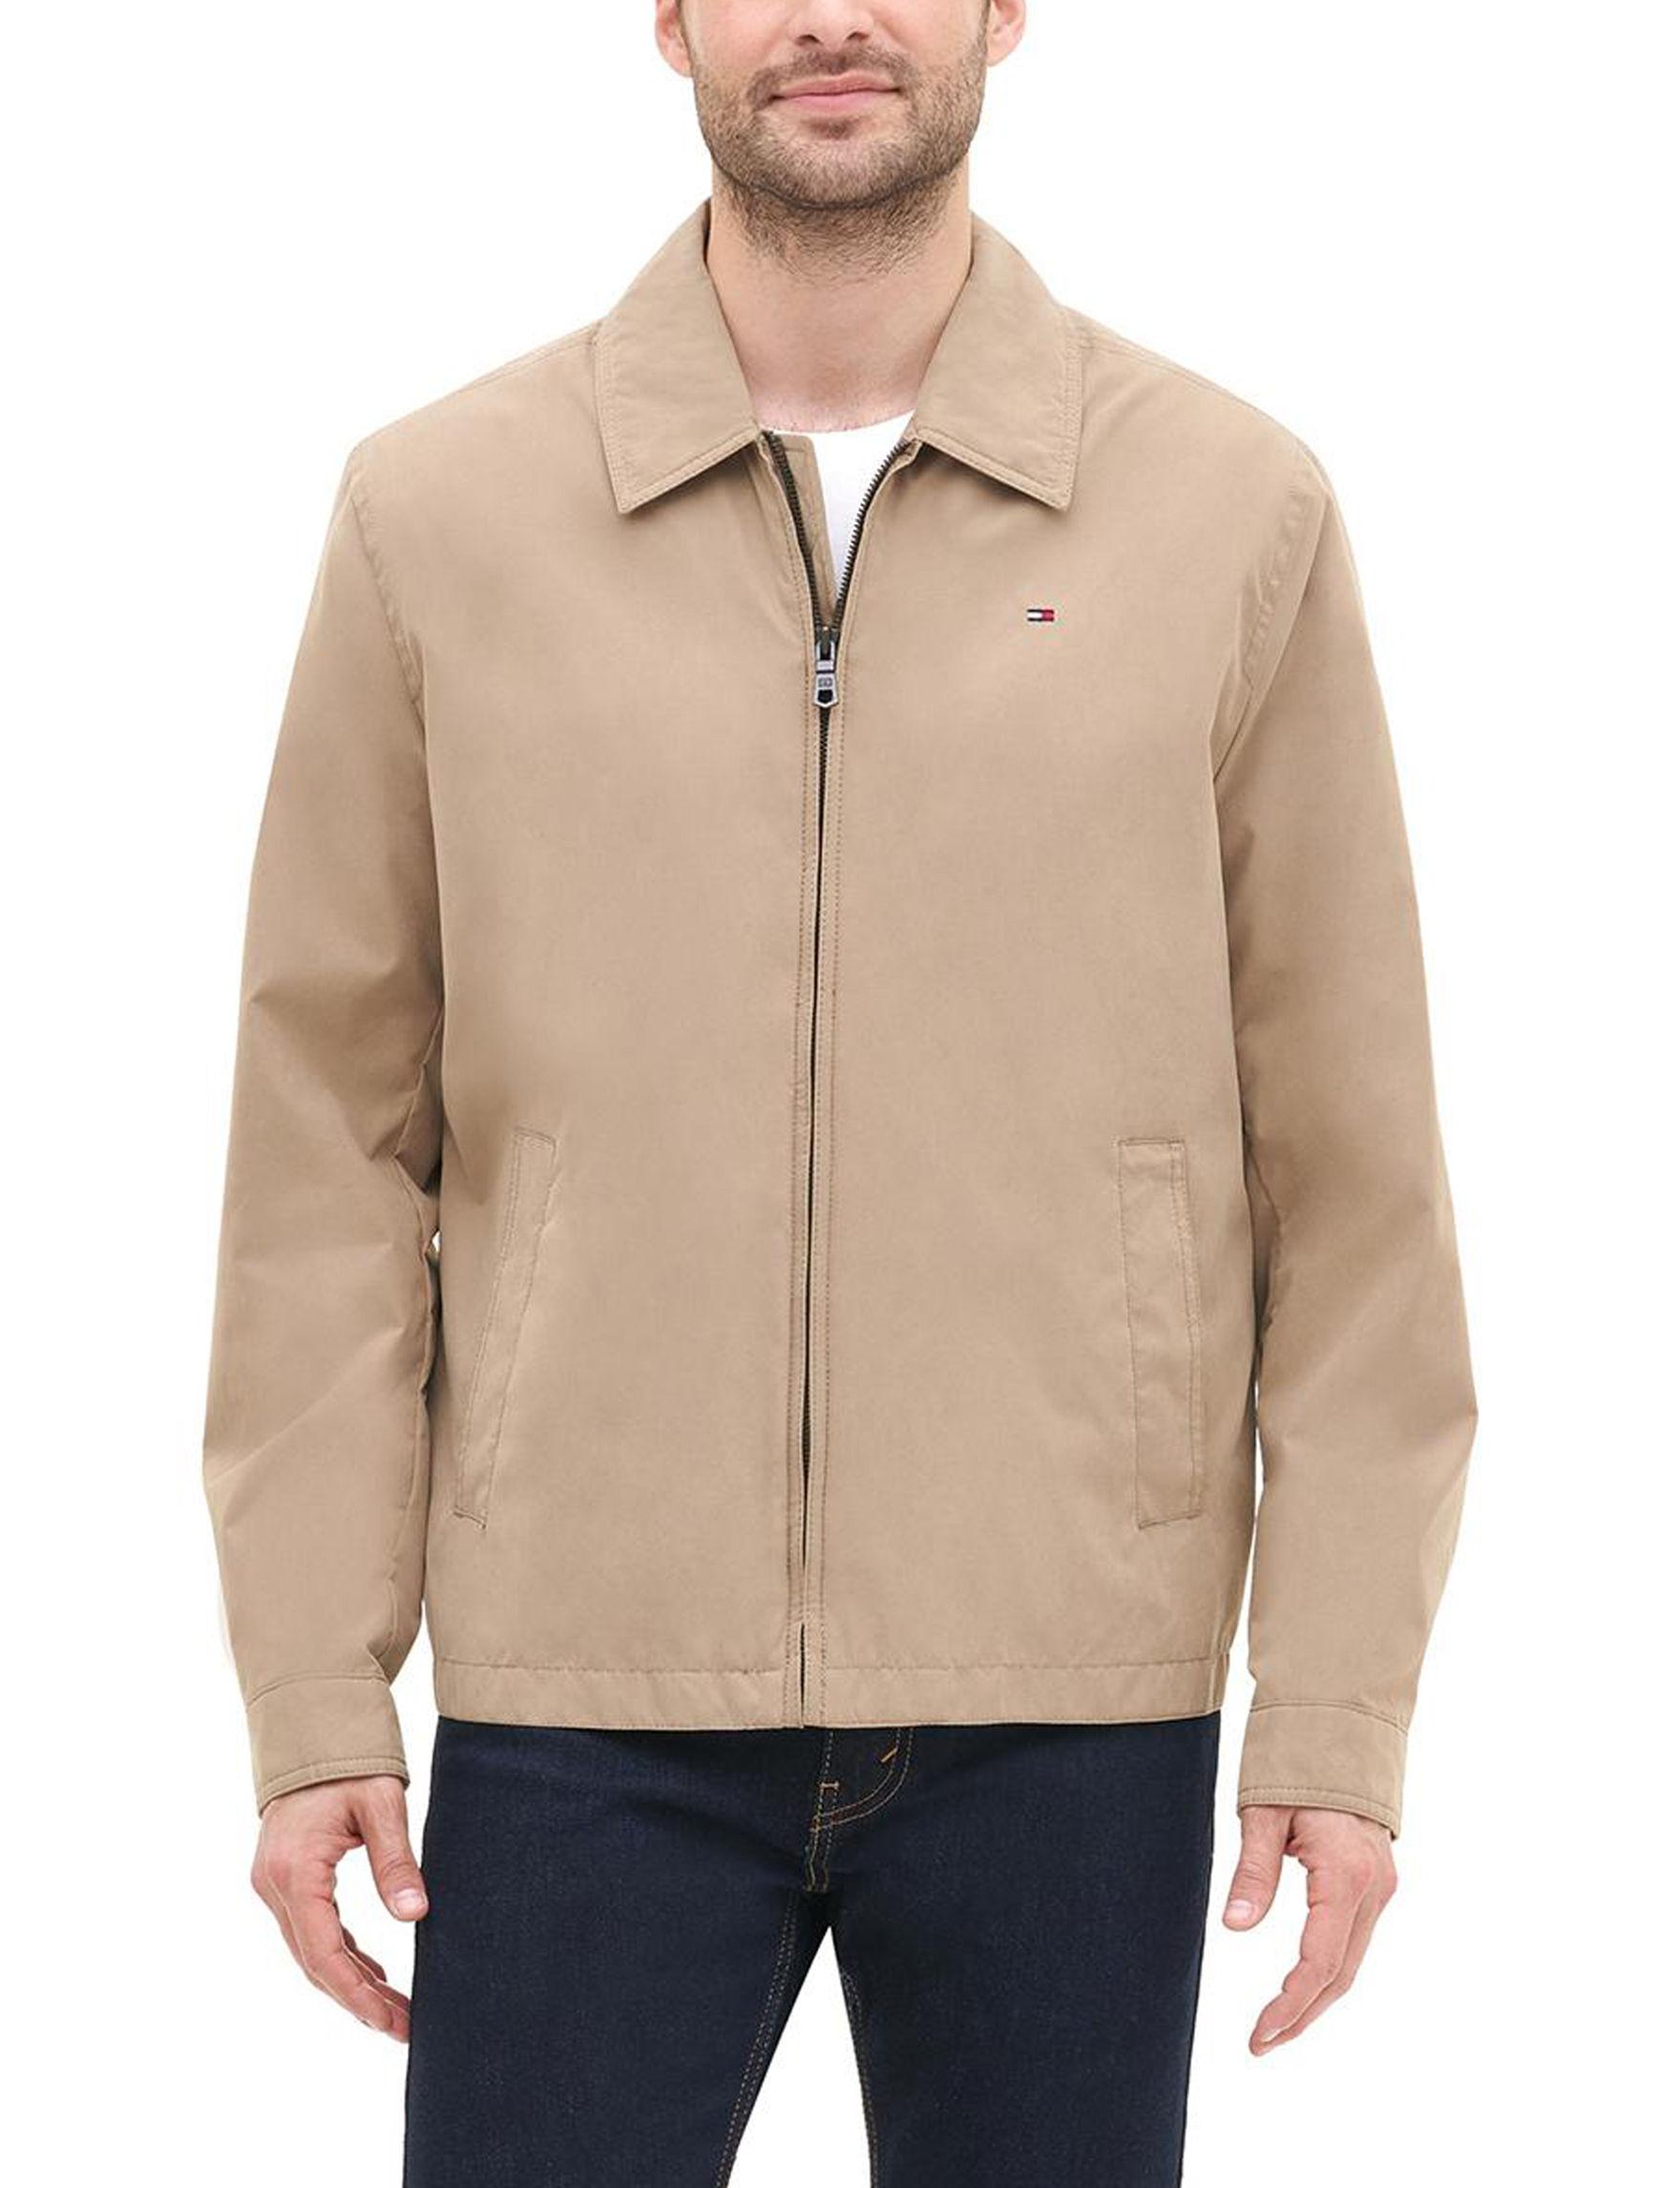 Tommy Hilfiger Khaki Lightweight Jackets & Blazers